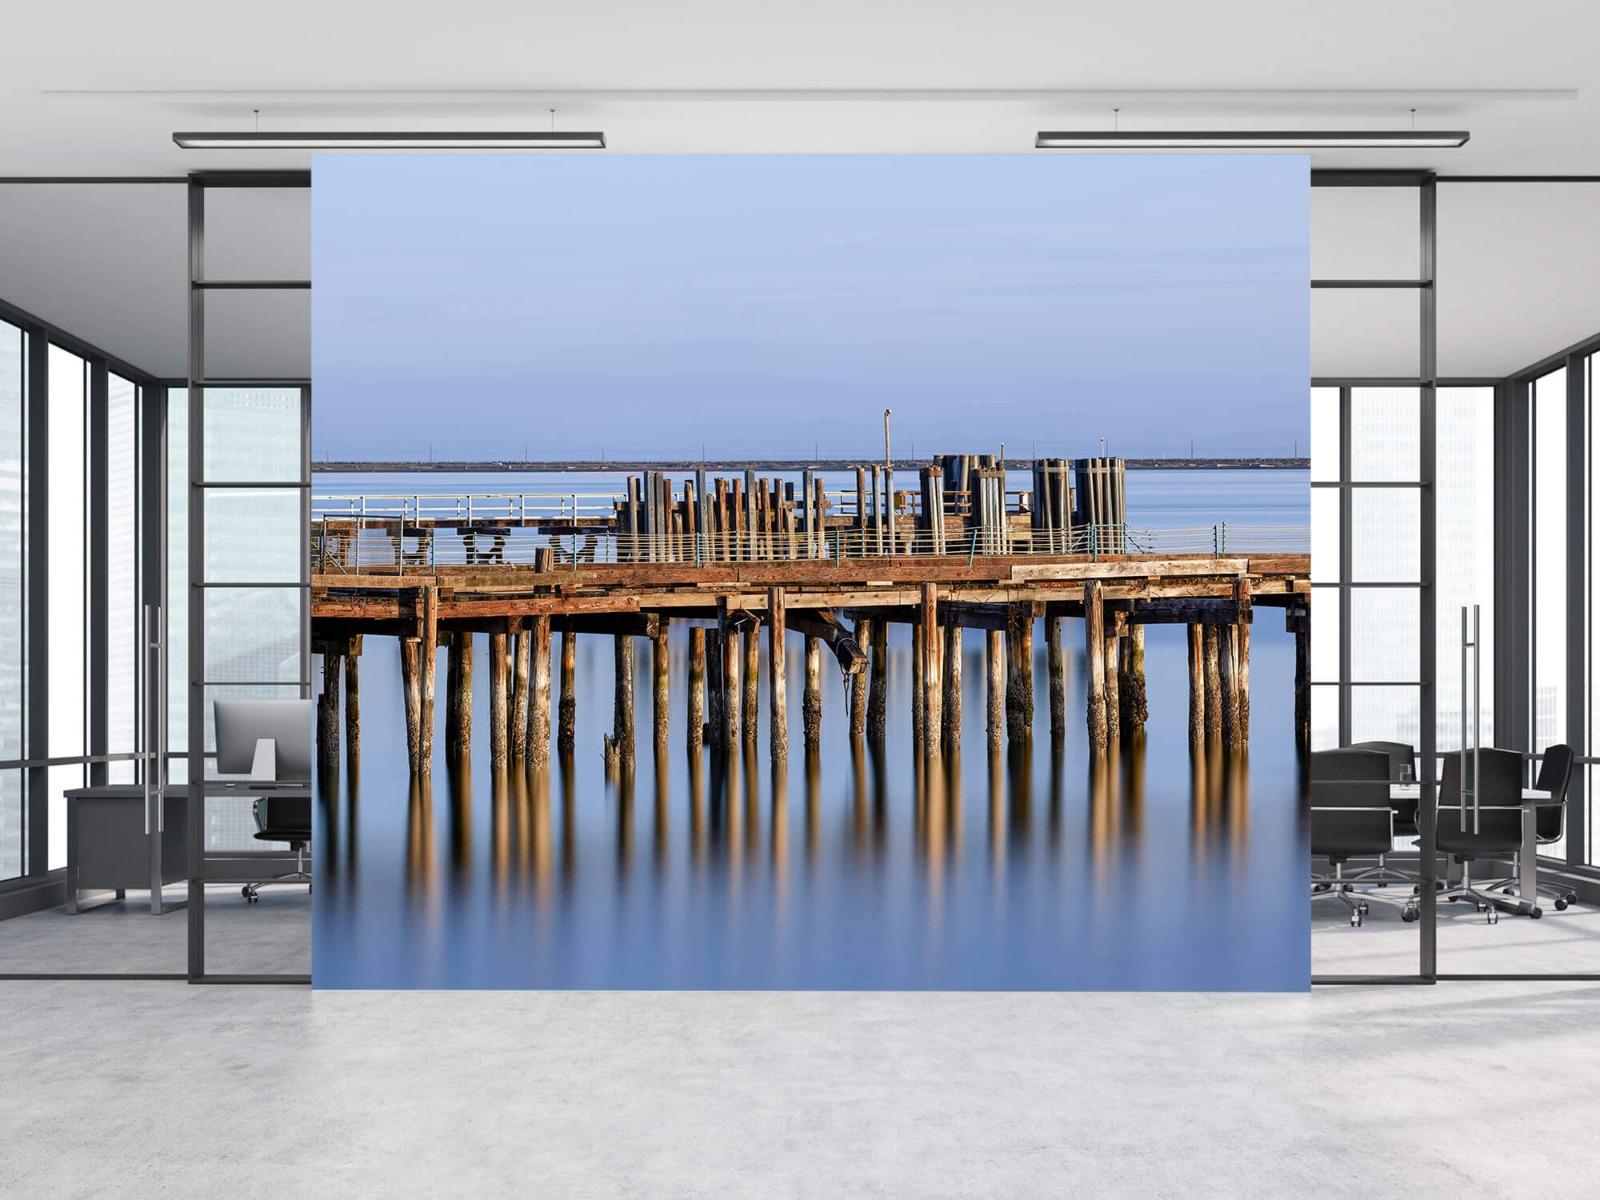 Houten Steigers - Steiger op houten palen - Wallexclusive - Slaapkamer 9